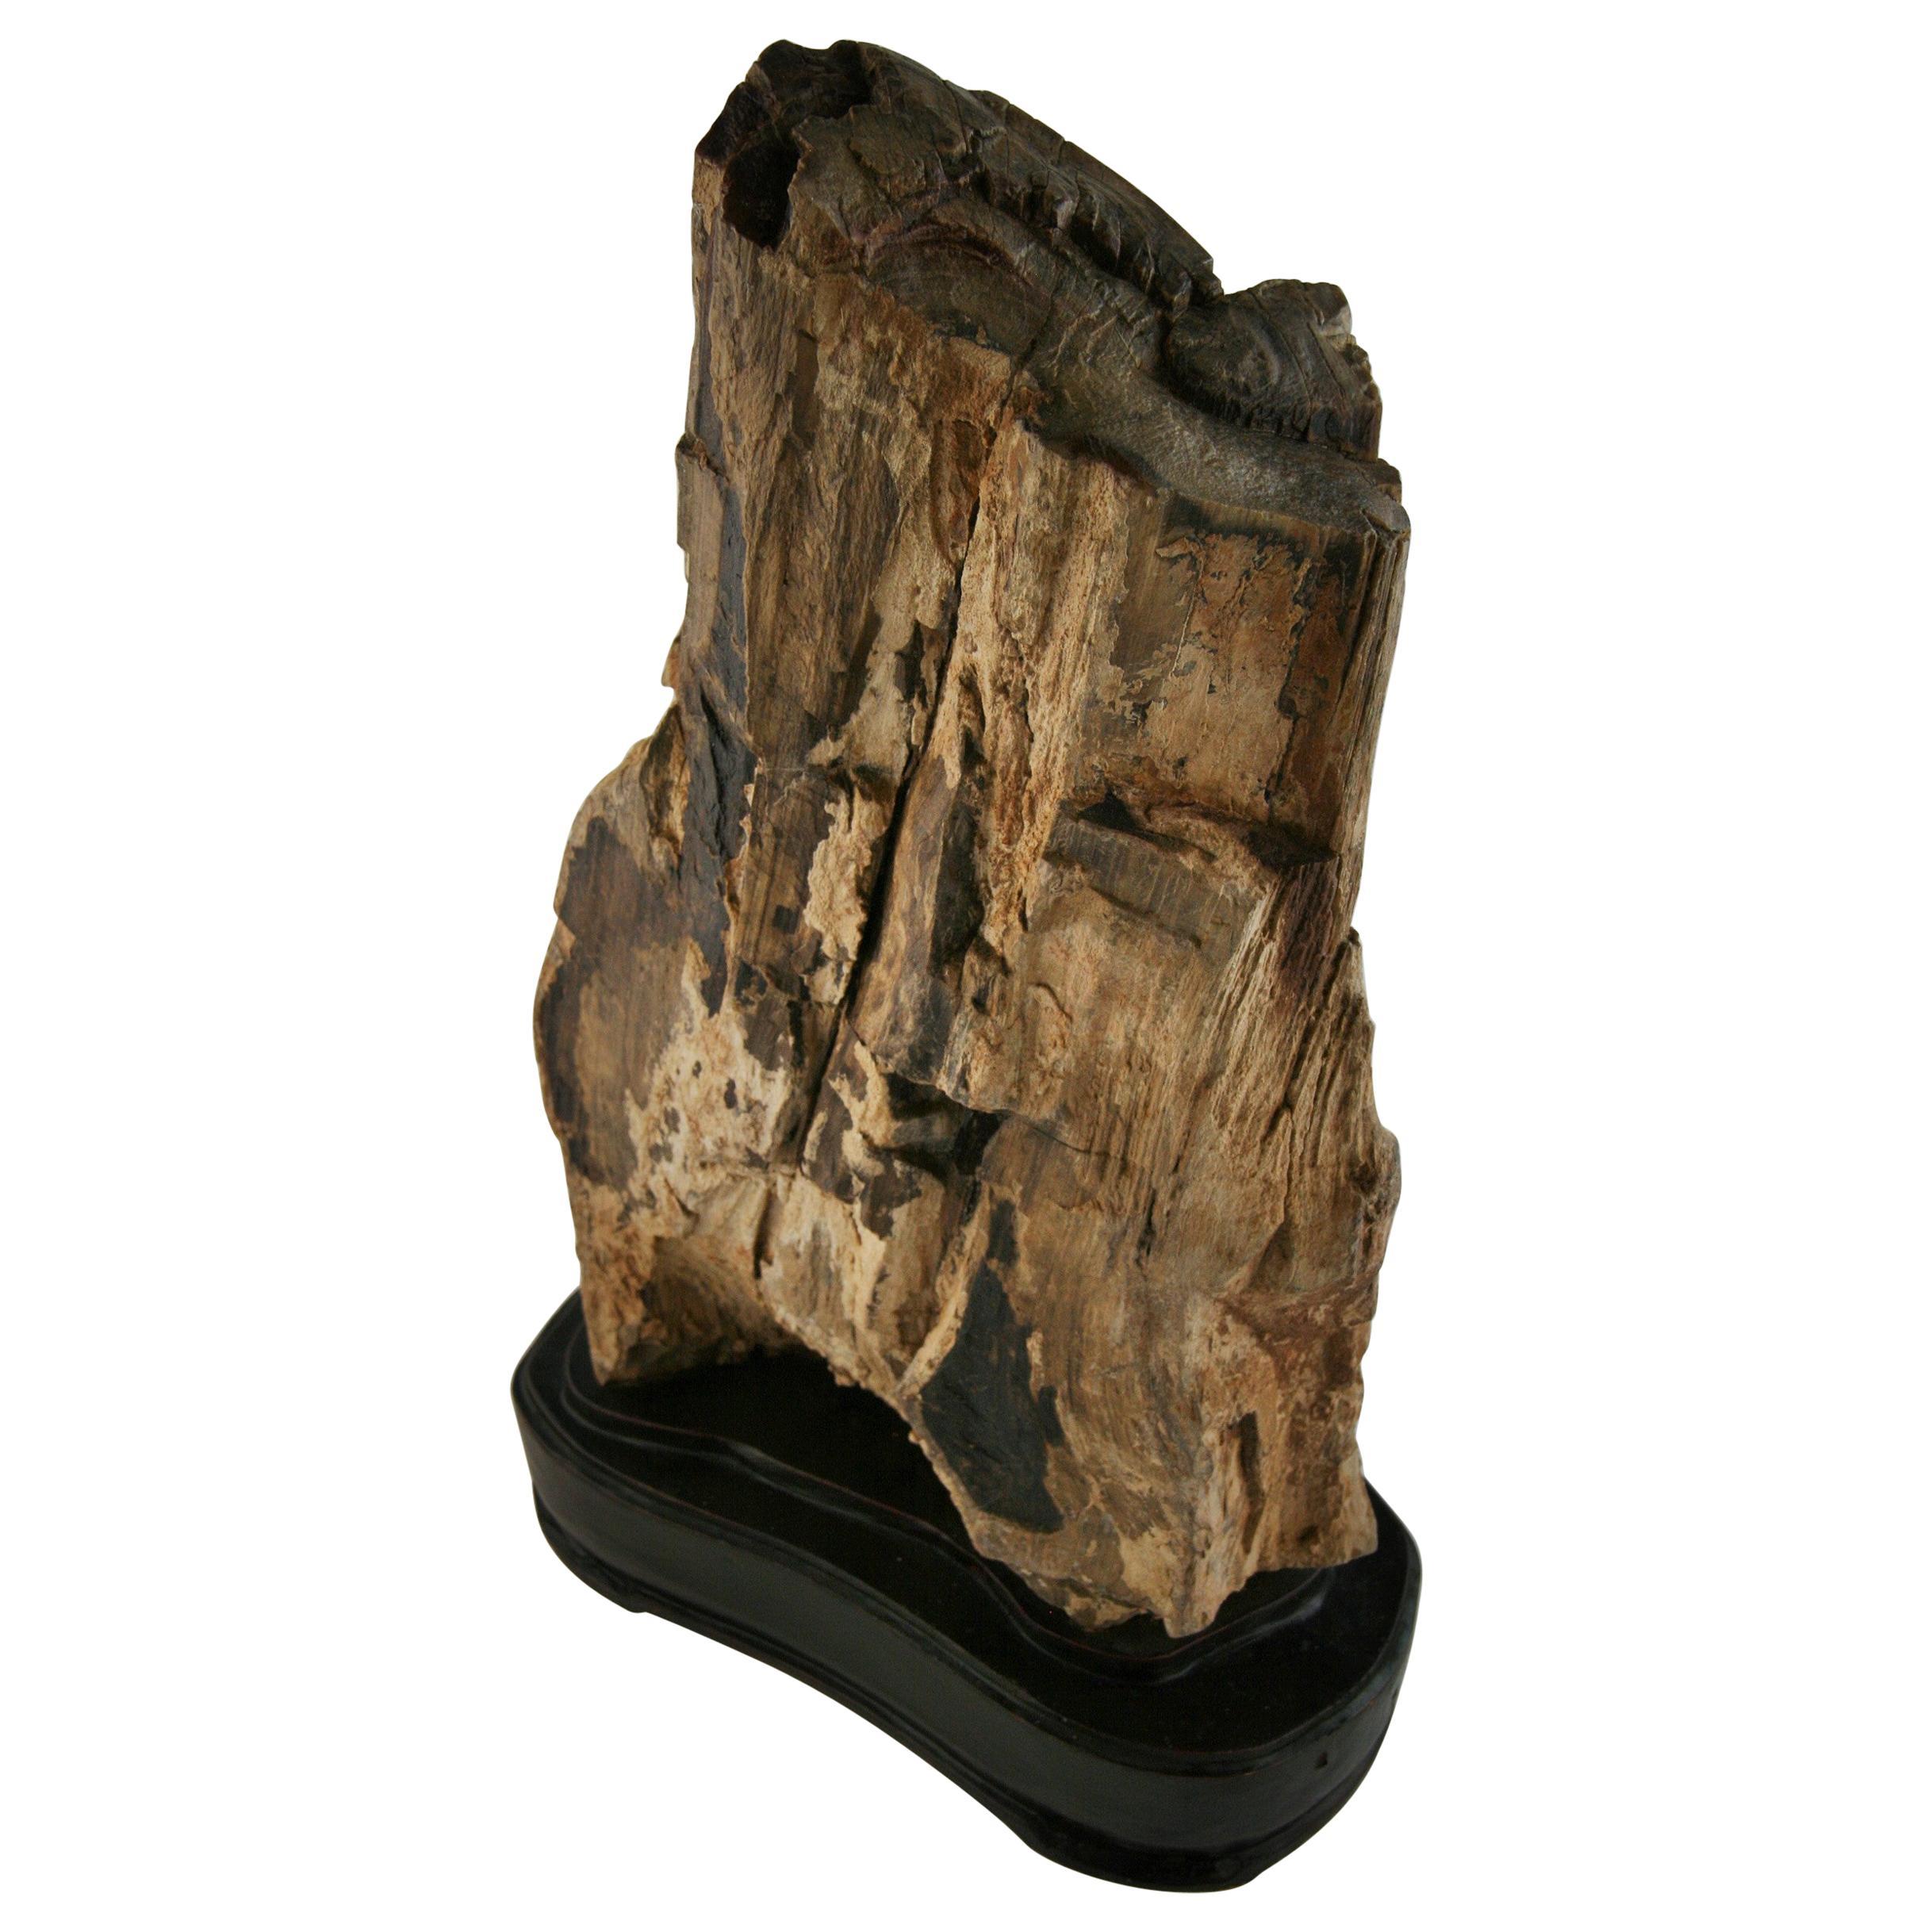 Natural Large  Petrified Wood as Sculpture